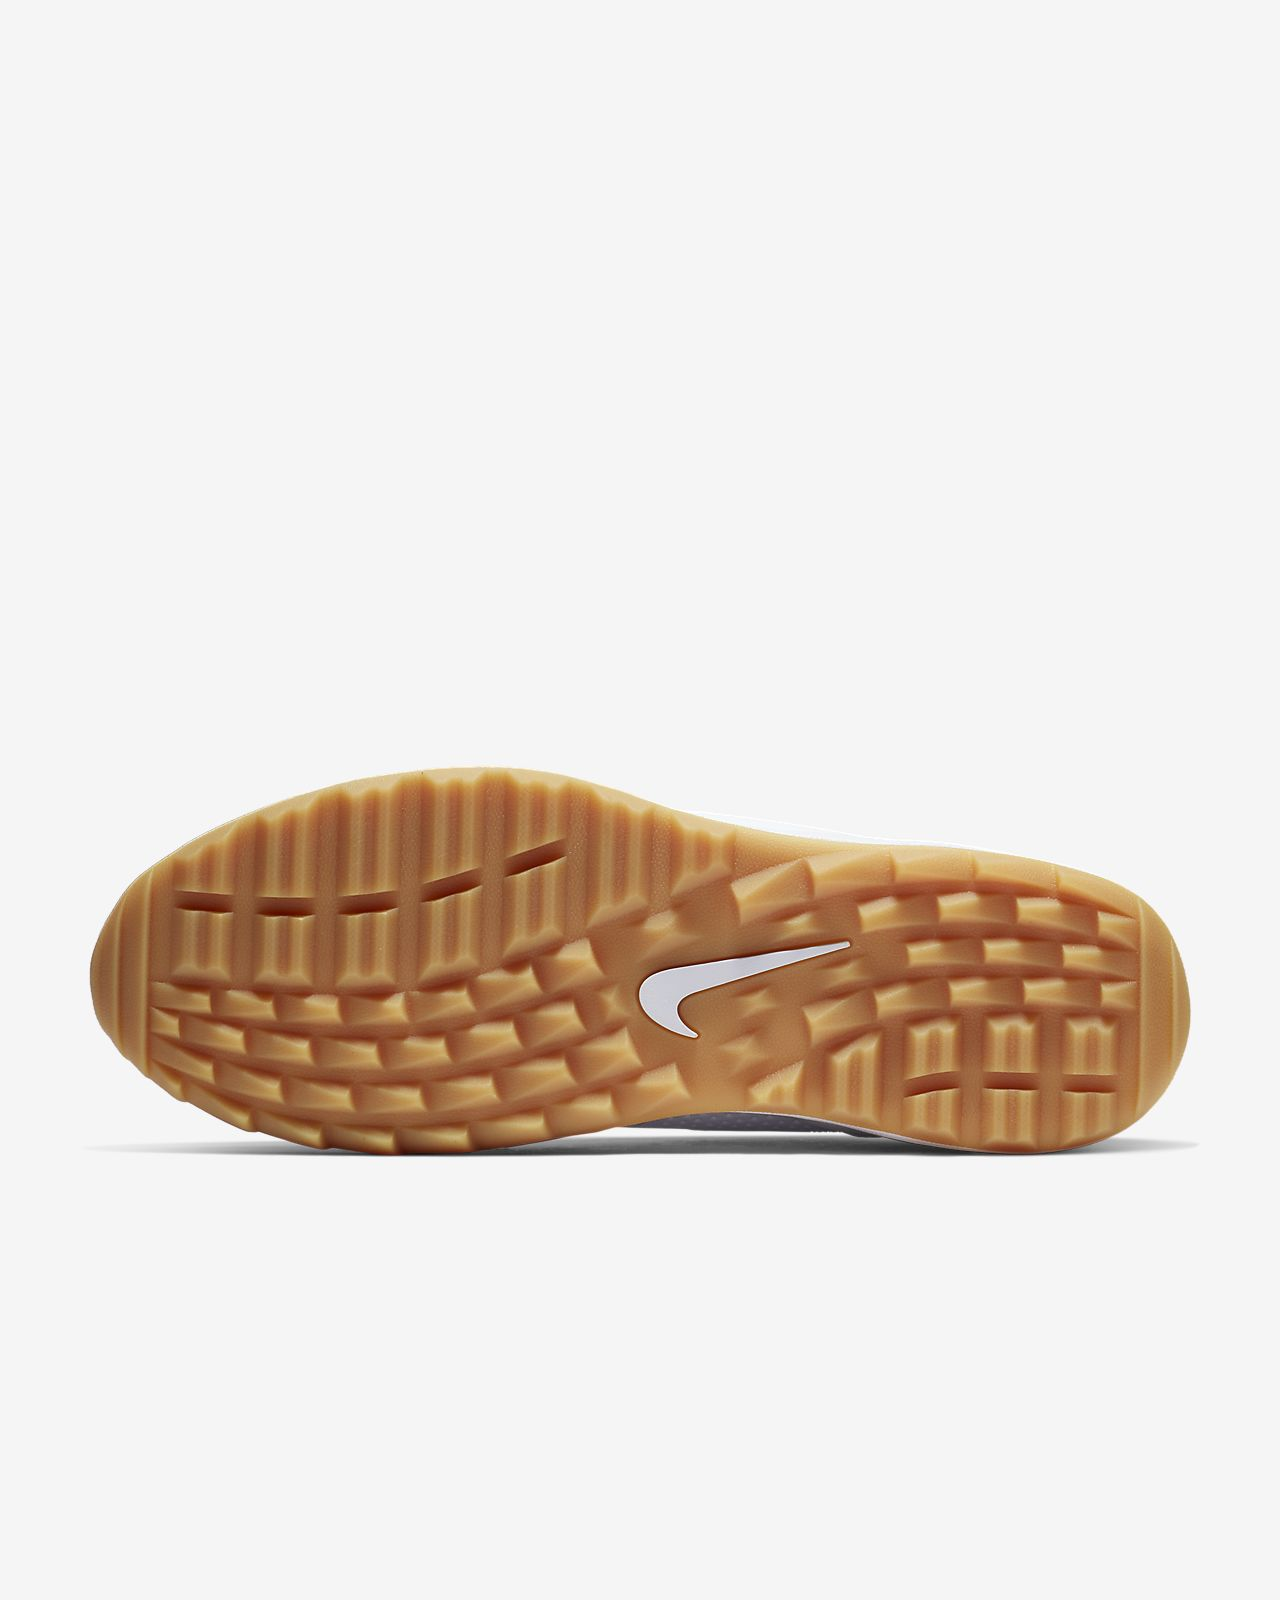 promo code 16d24 d07d6 ... Nike Air Max 1 G Men s Golf Shoe